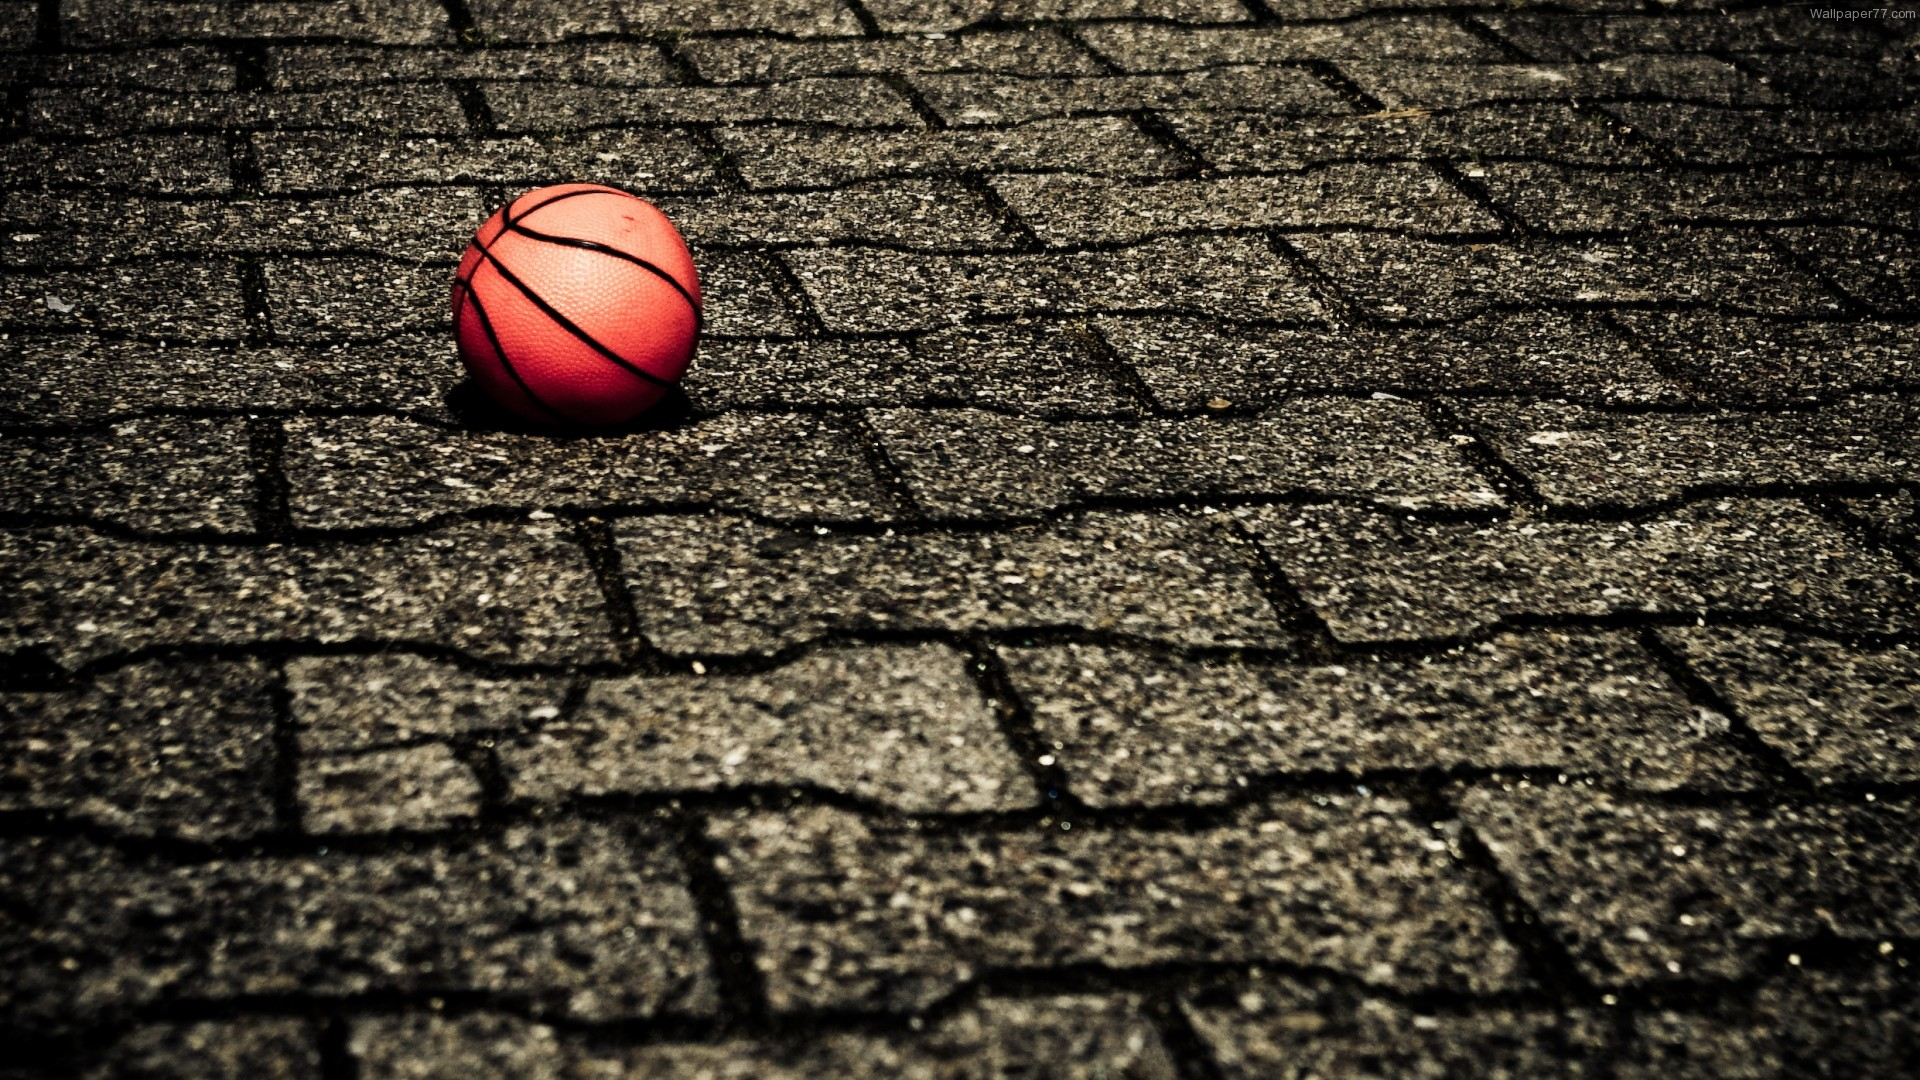 Баскетбол, фотографии, спорт, обои, фото